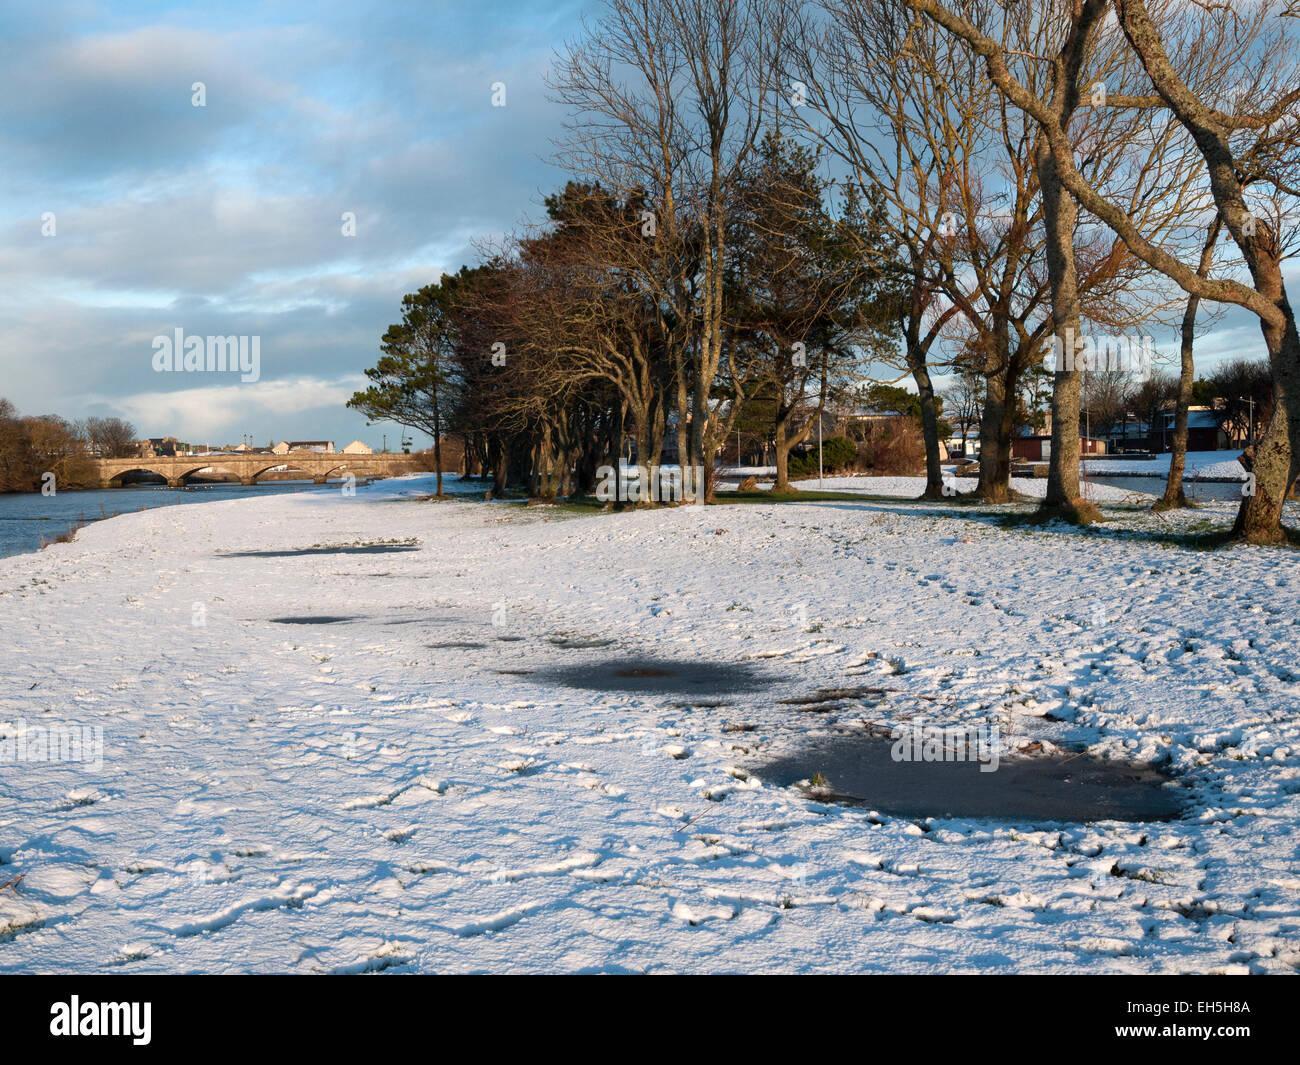 Trees and snow on the riverside walk, Thurso, Caithness, Scotland, UK - Stock Image